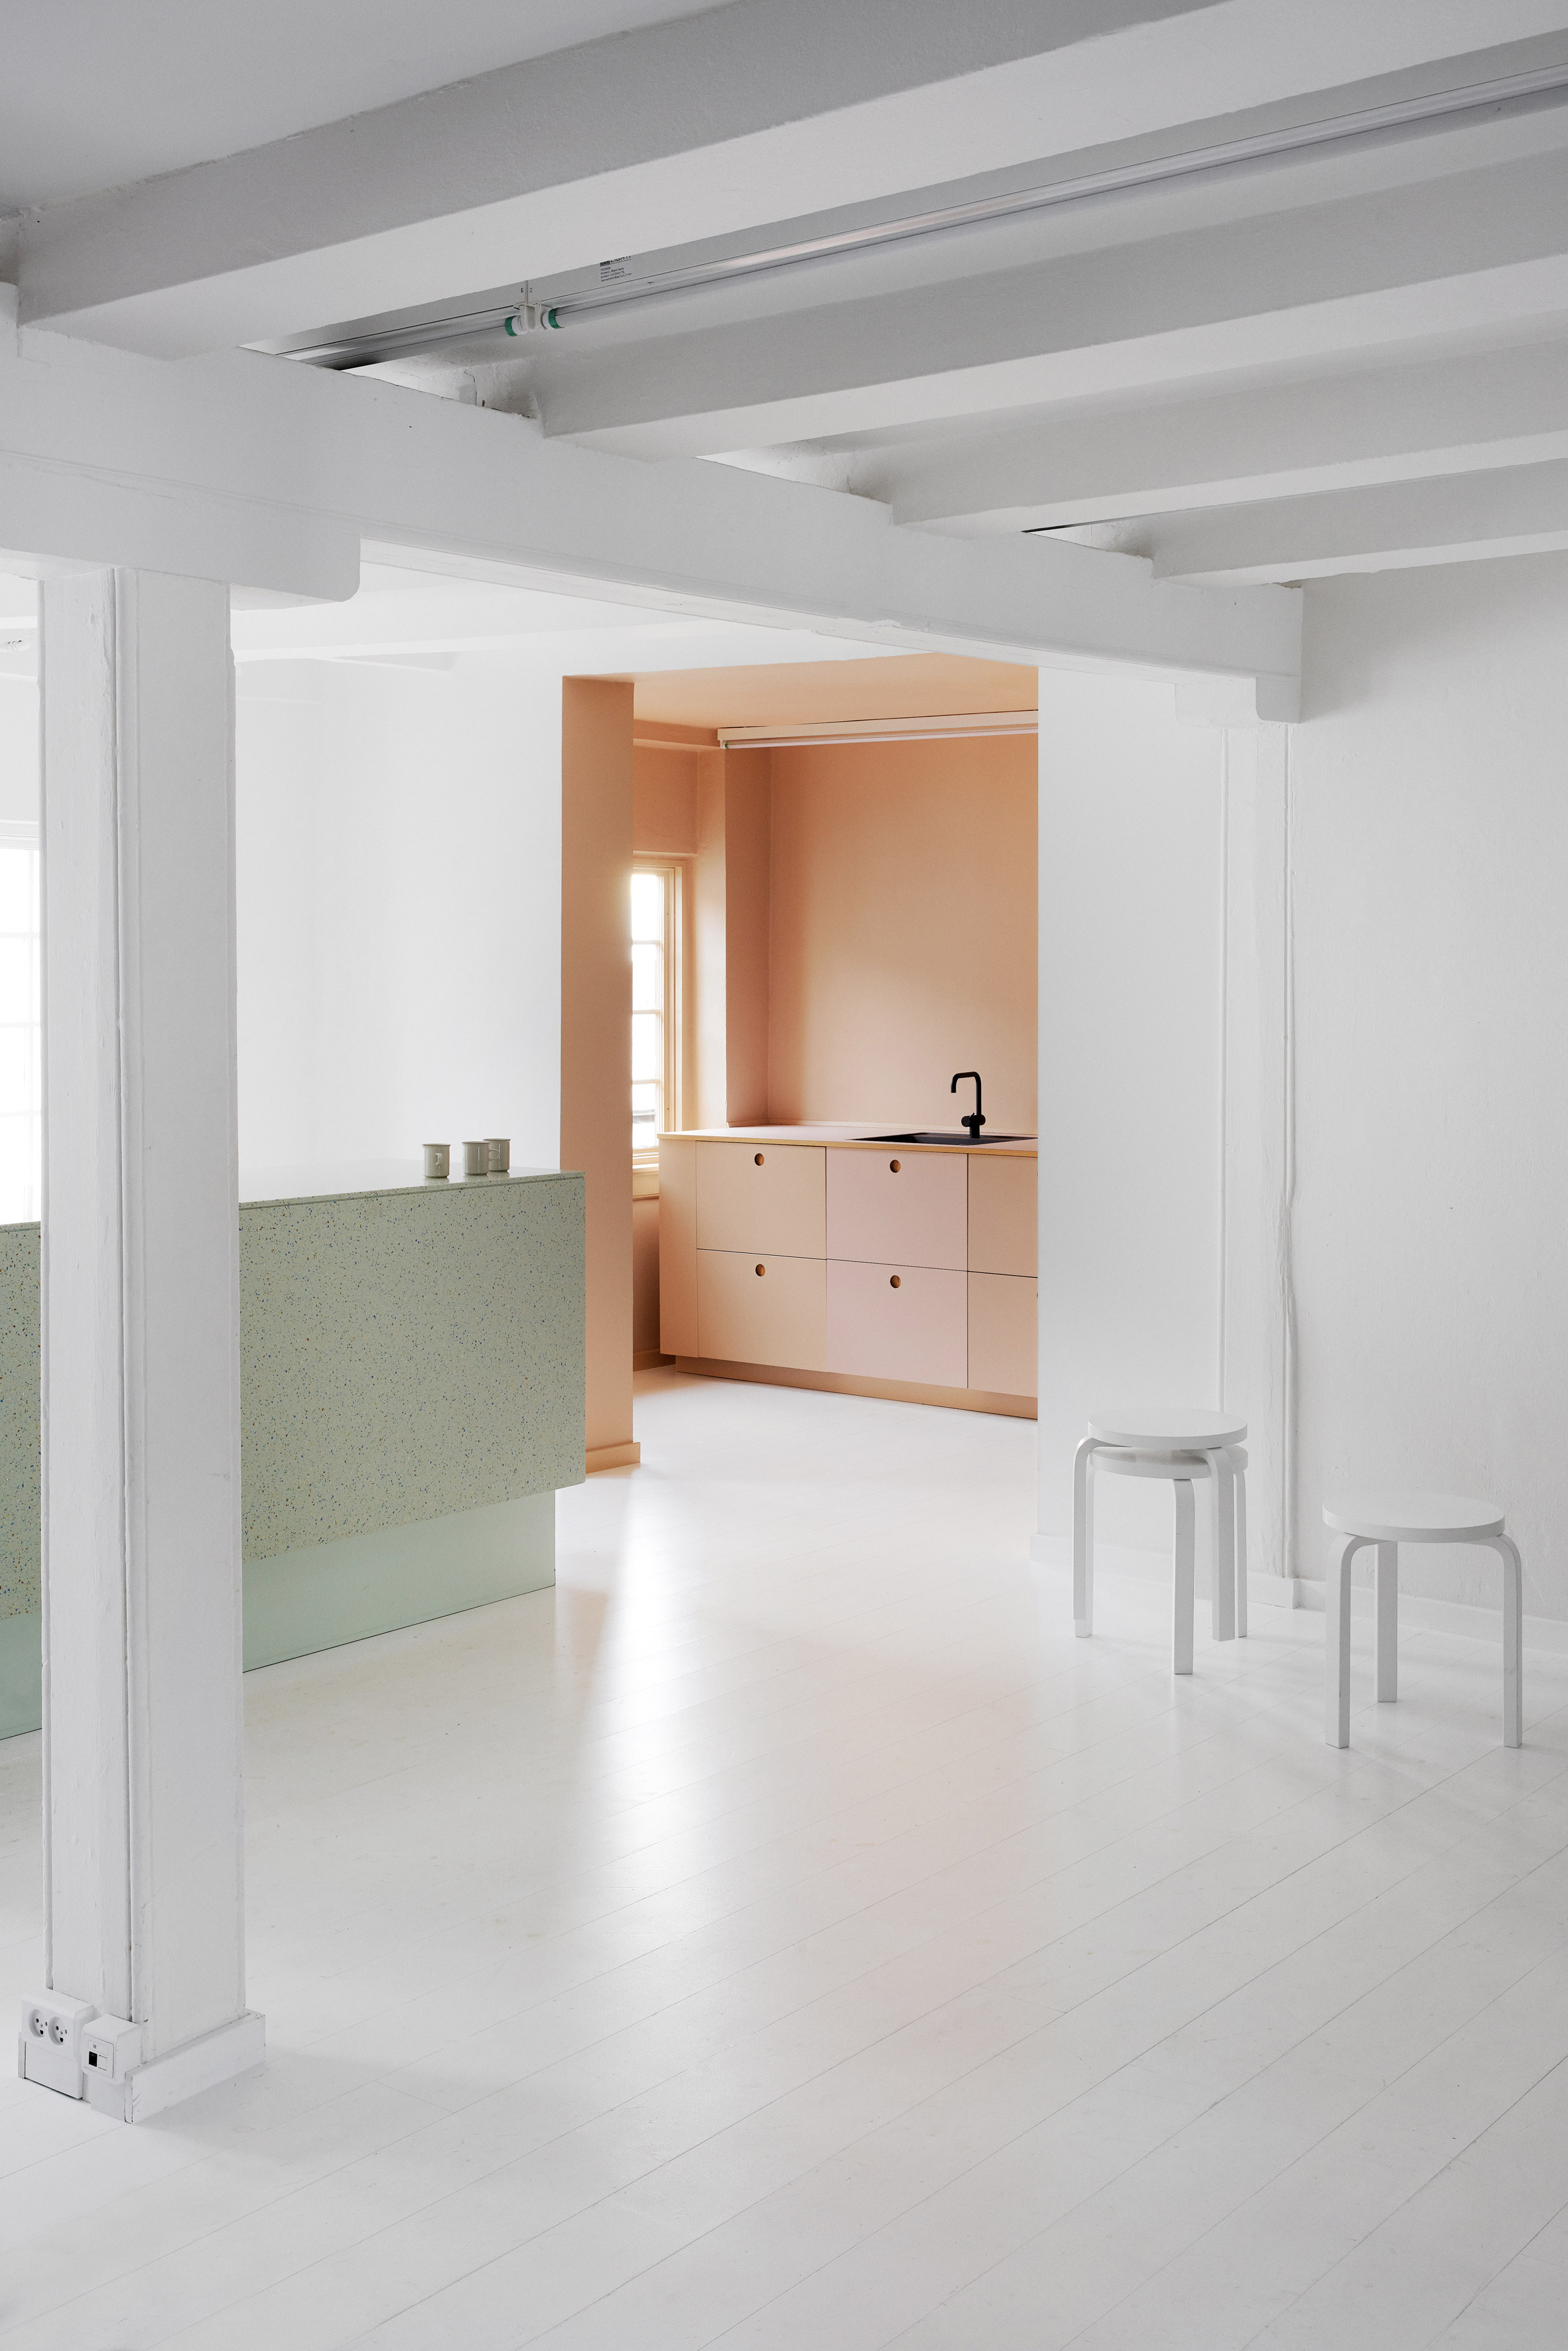 Designers Remix showroom in Copenhagen, designed by Reform